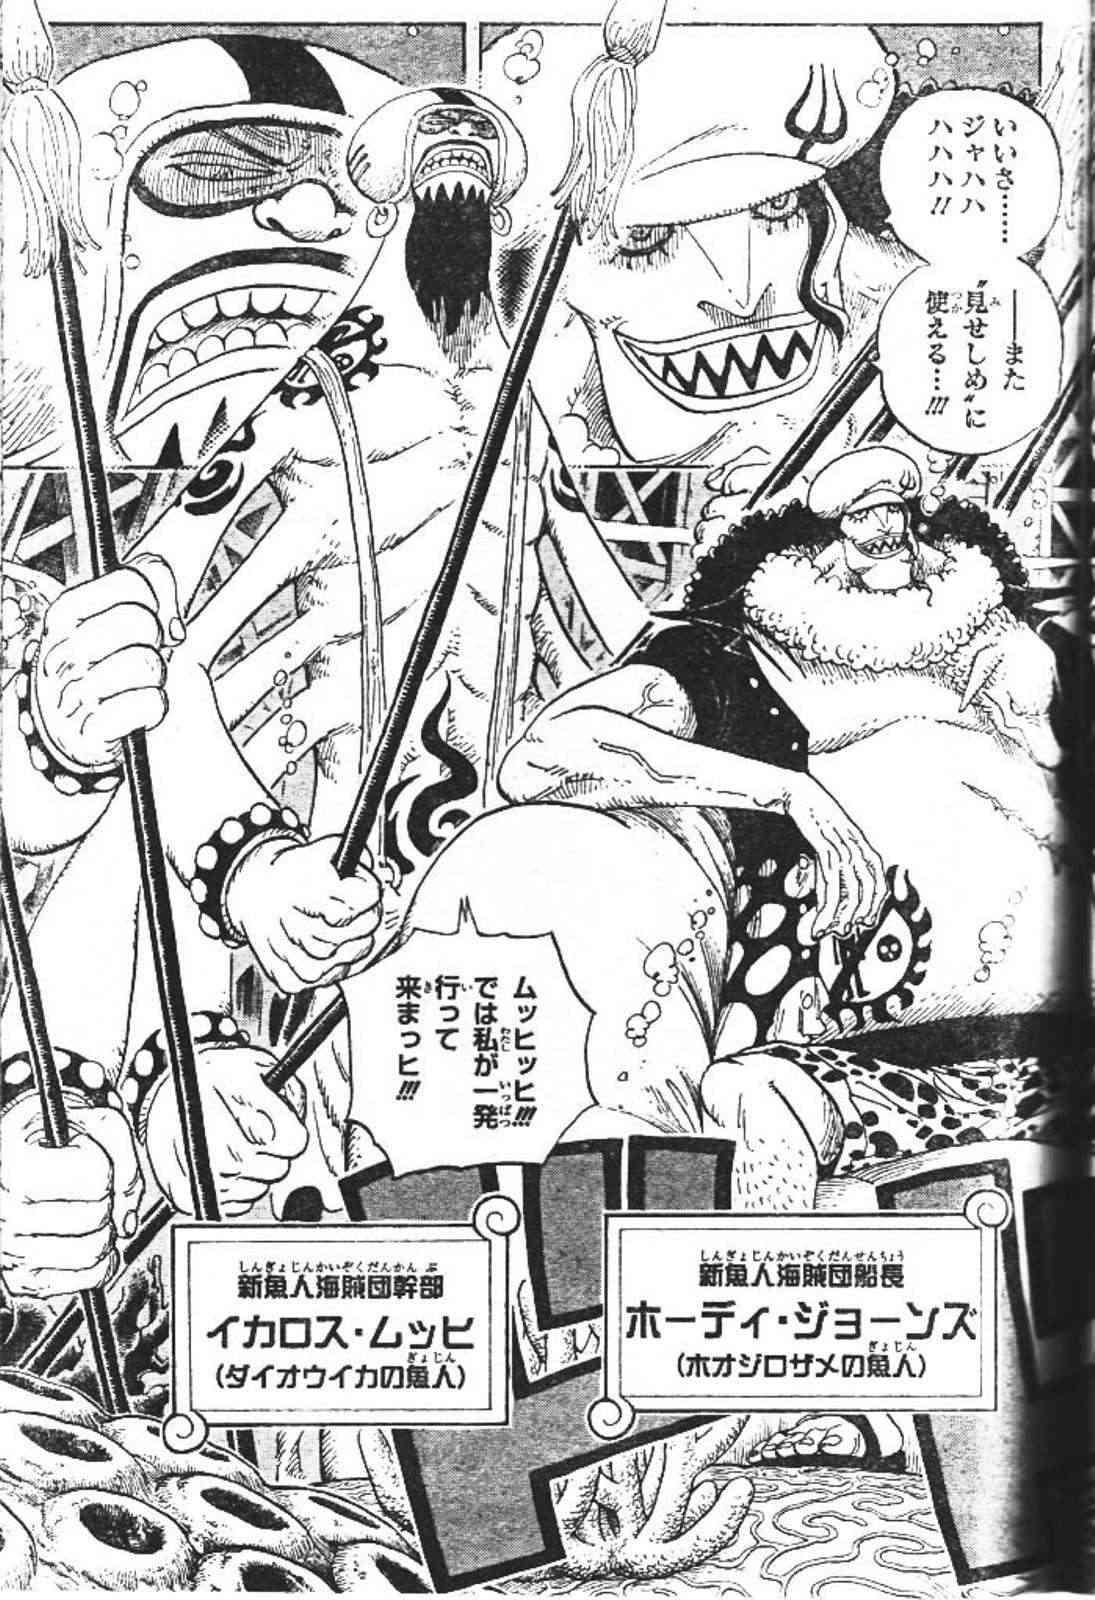 One Piece Manga 611 Spoiler Pics 05_raw10